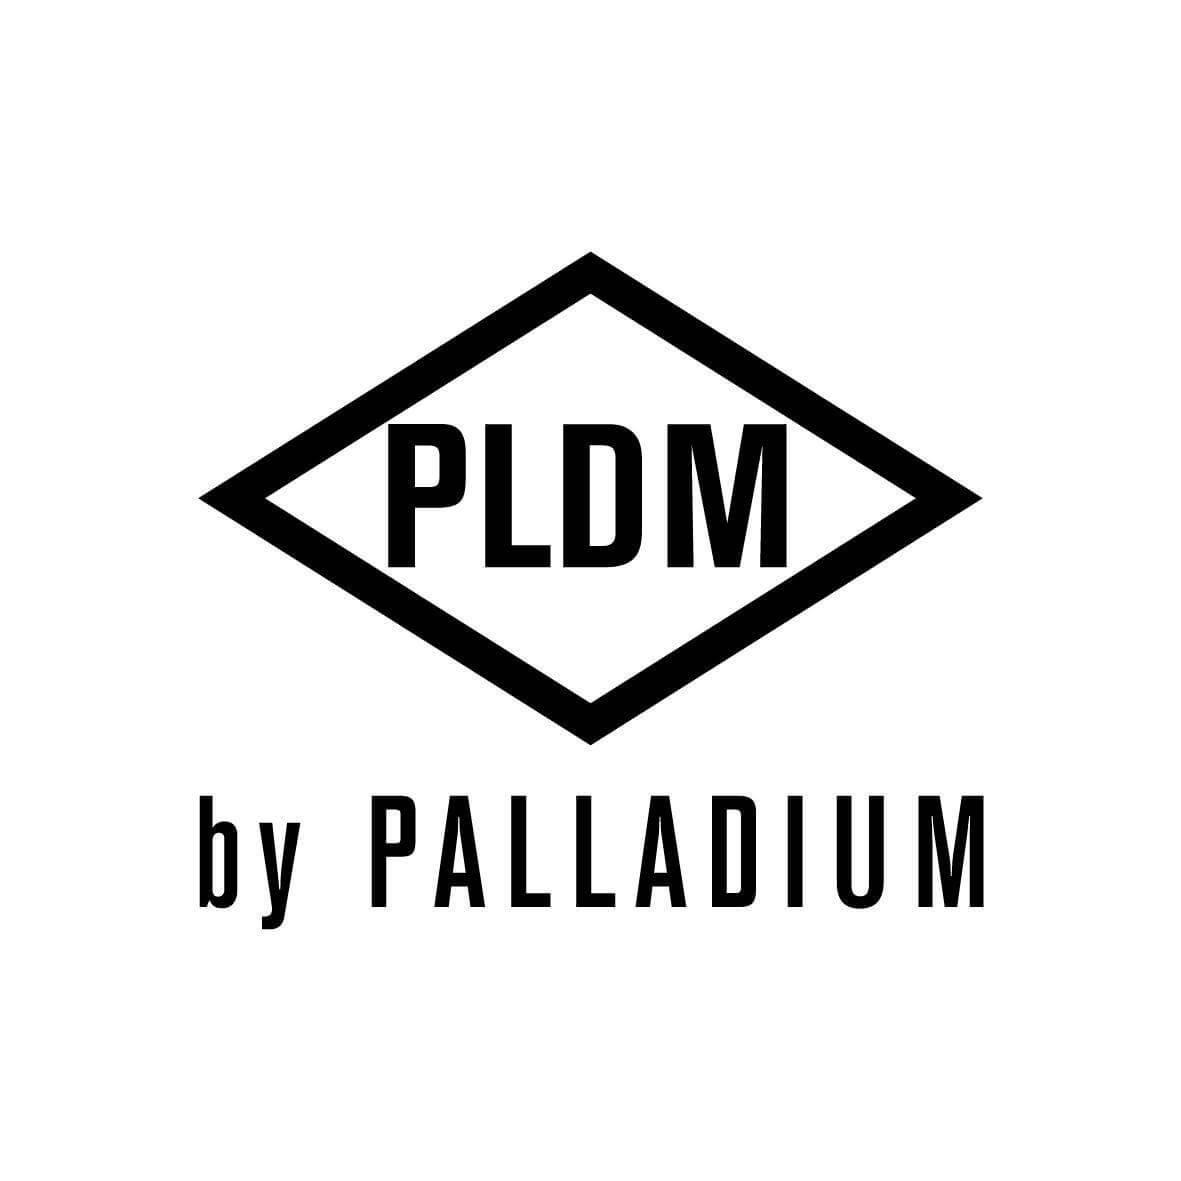 PLDM by Palladium logo